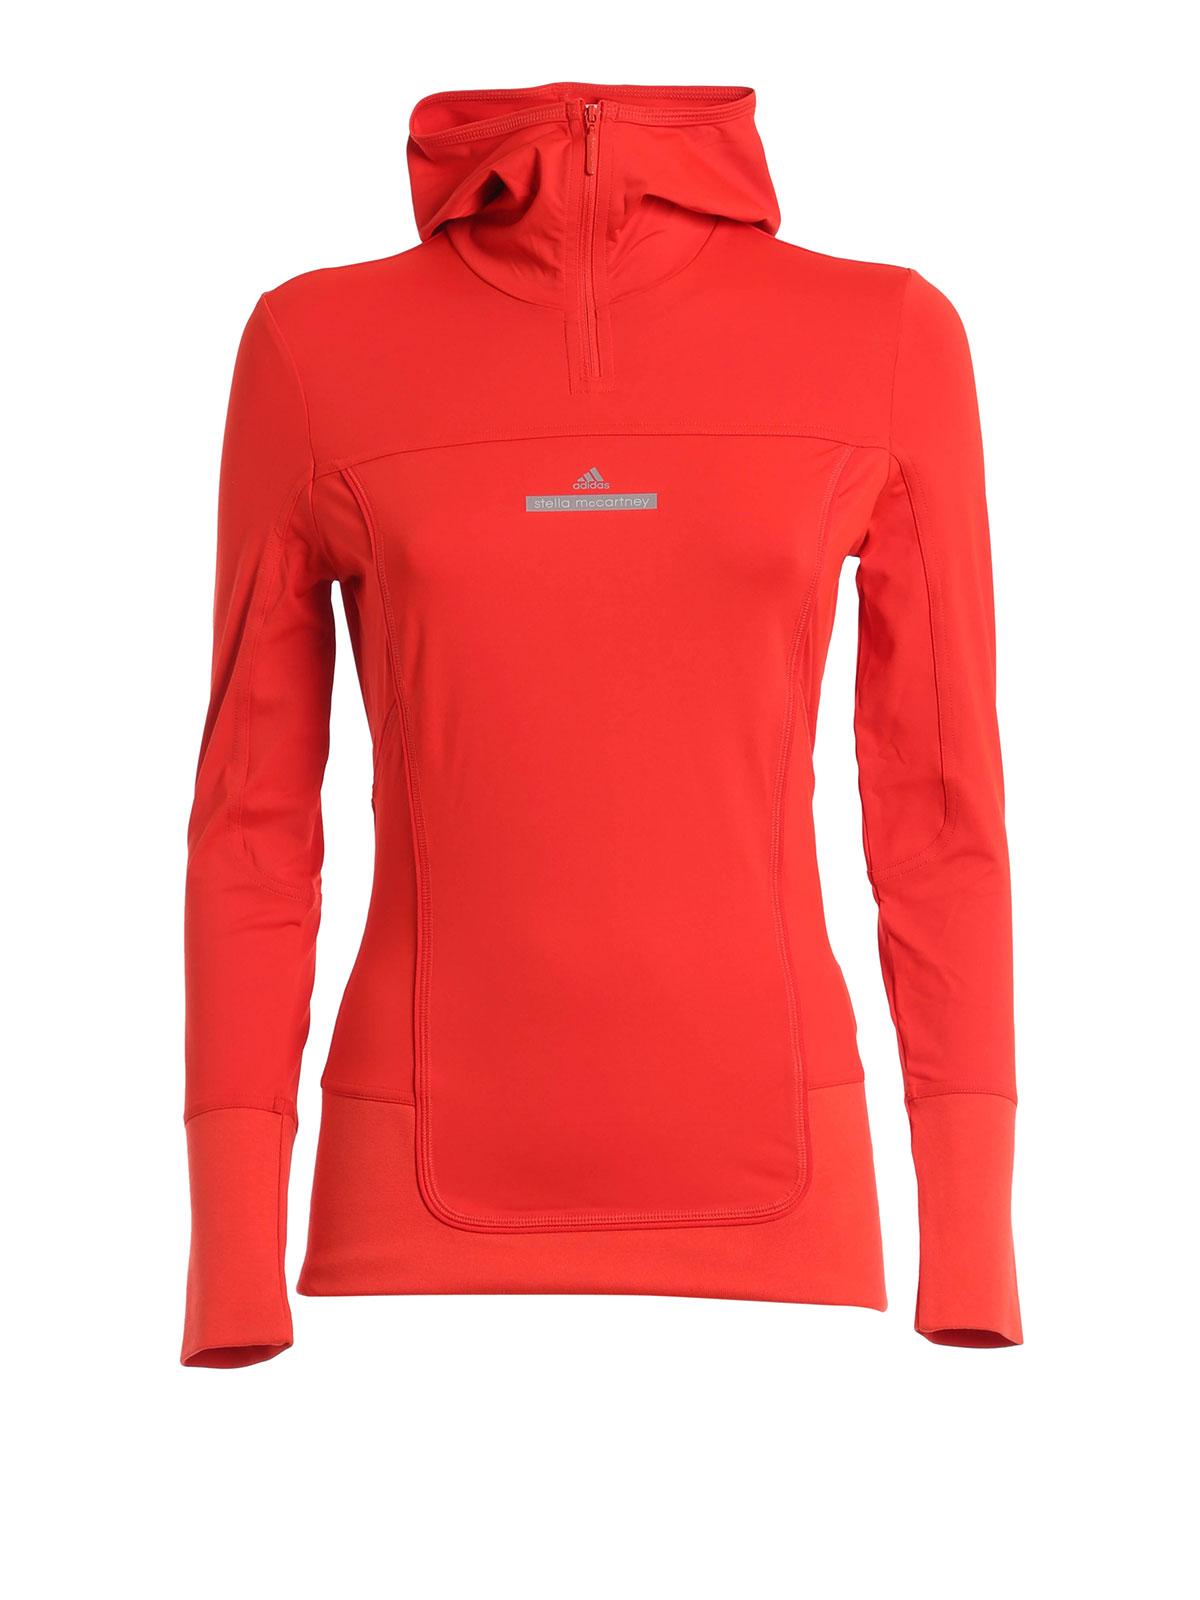 T Mccartney By Sweatshirts Stella Adidas Shirt Essentials PqZEIIwxd